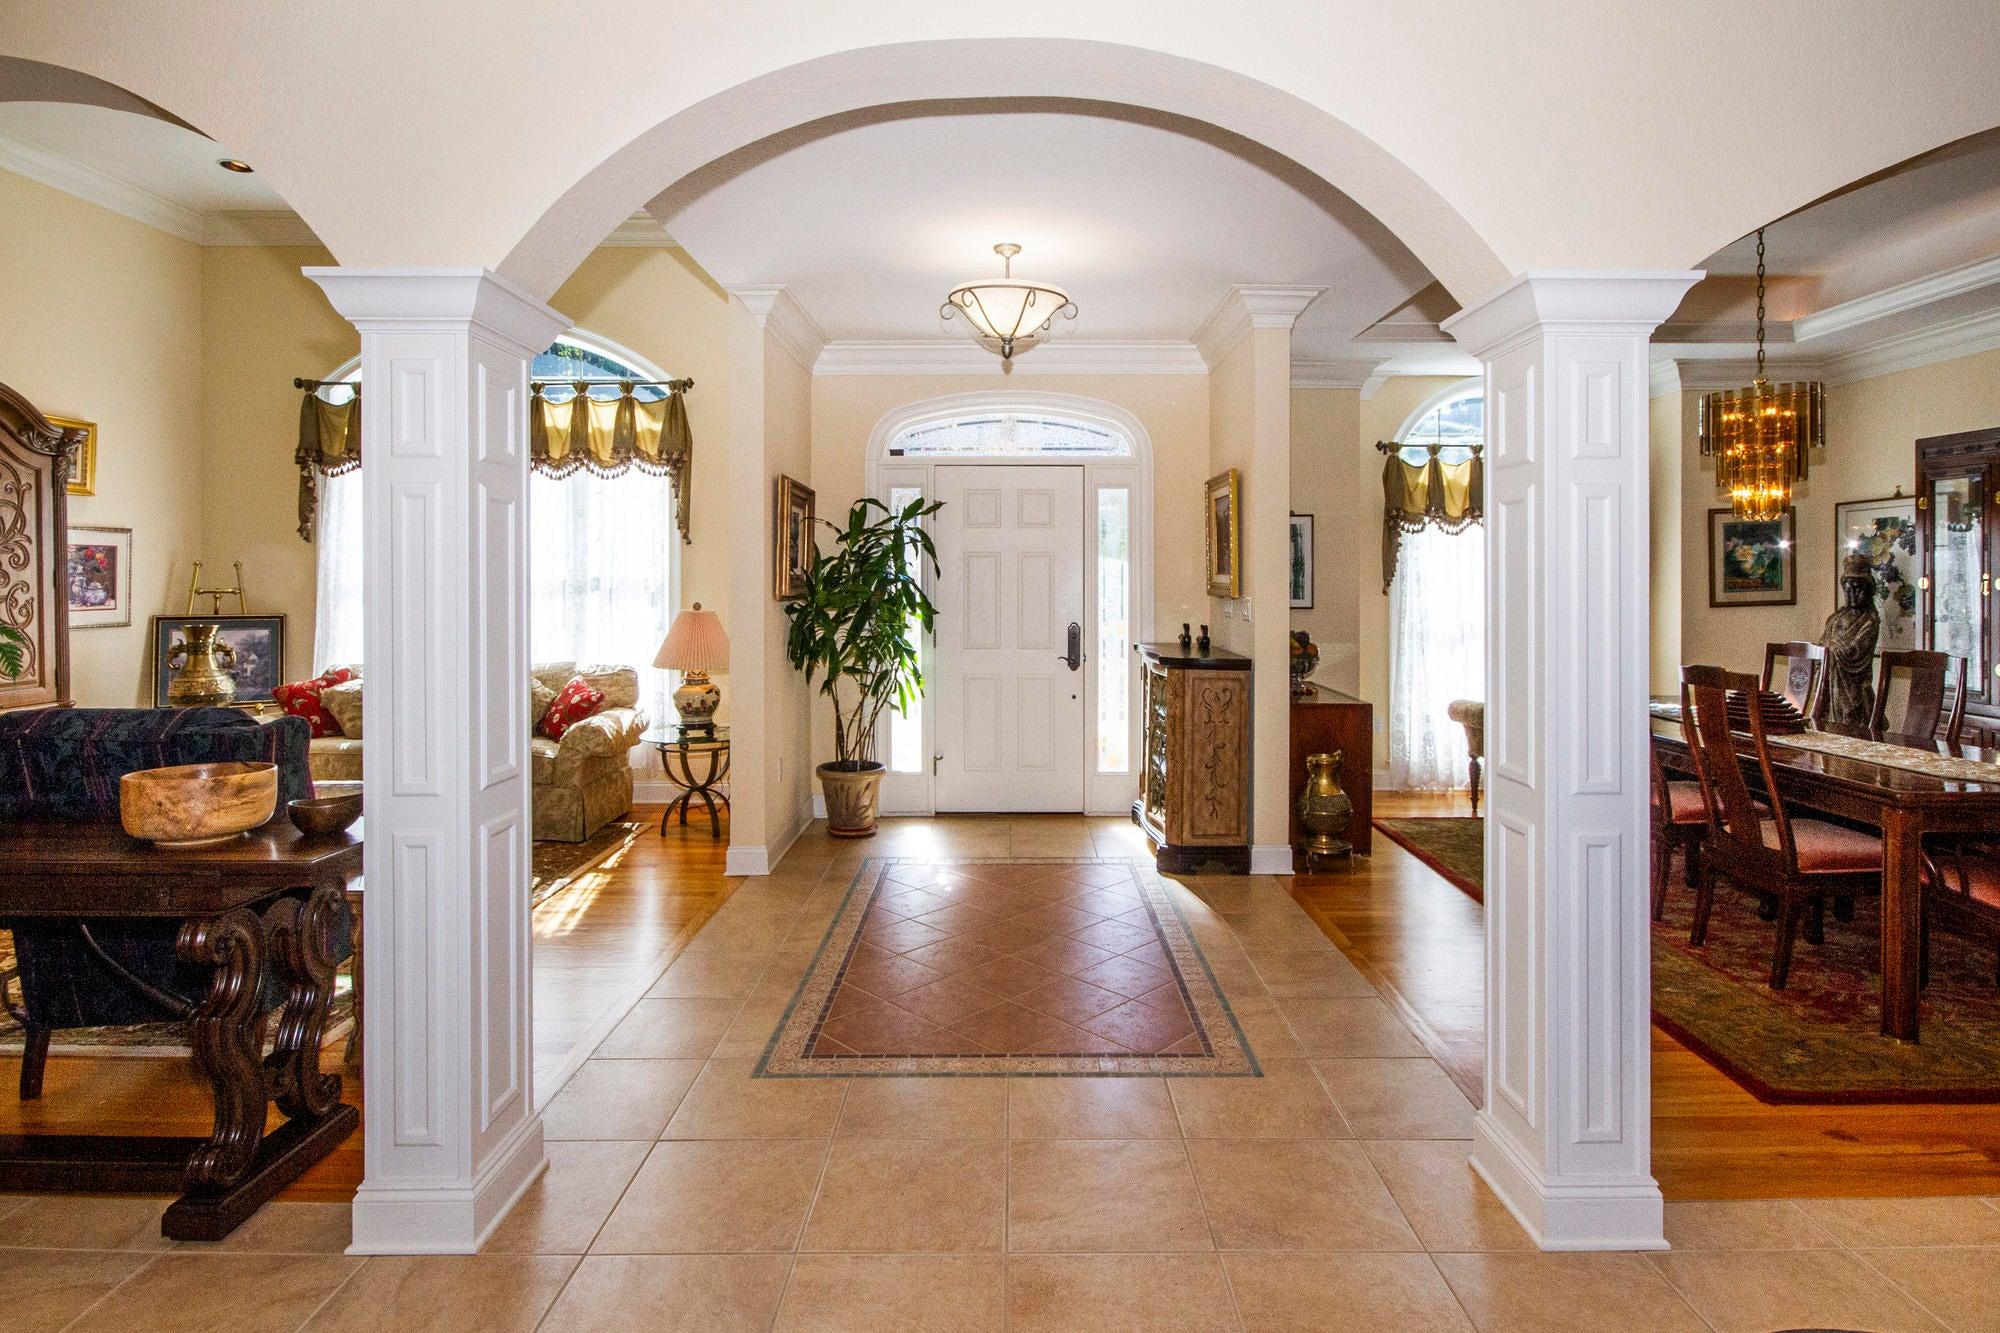 Beautiful Foyer & Millwork!